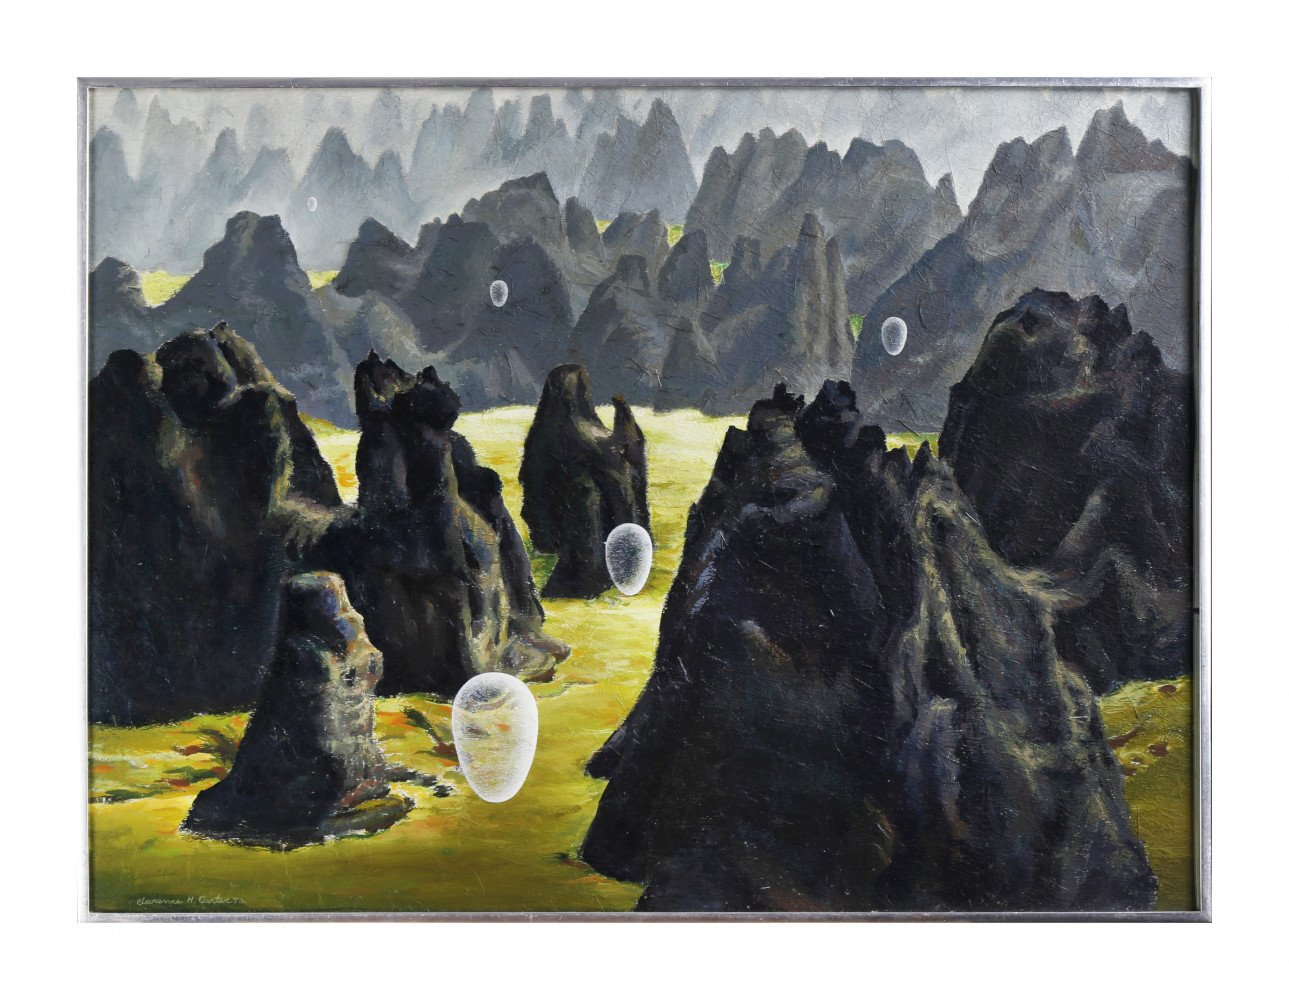 Eschatos No. 16 by Clarence Holbrook Carter